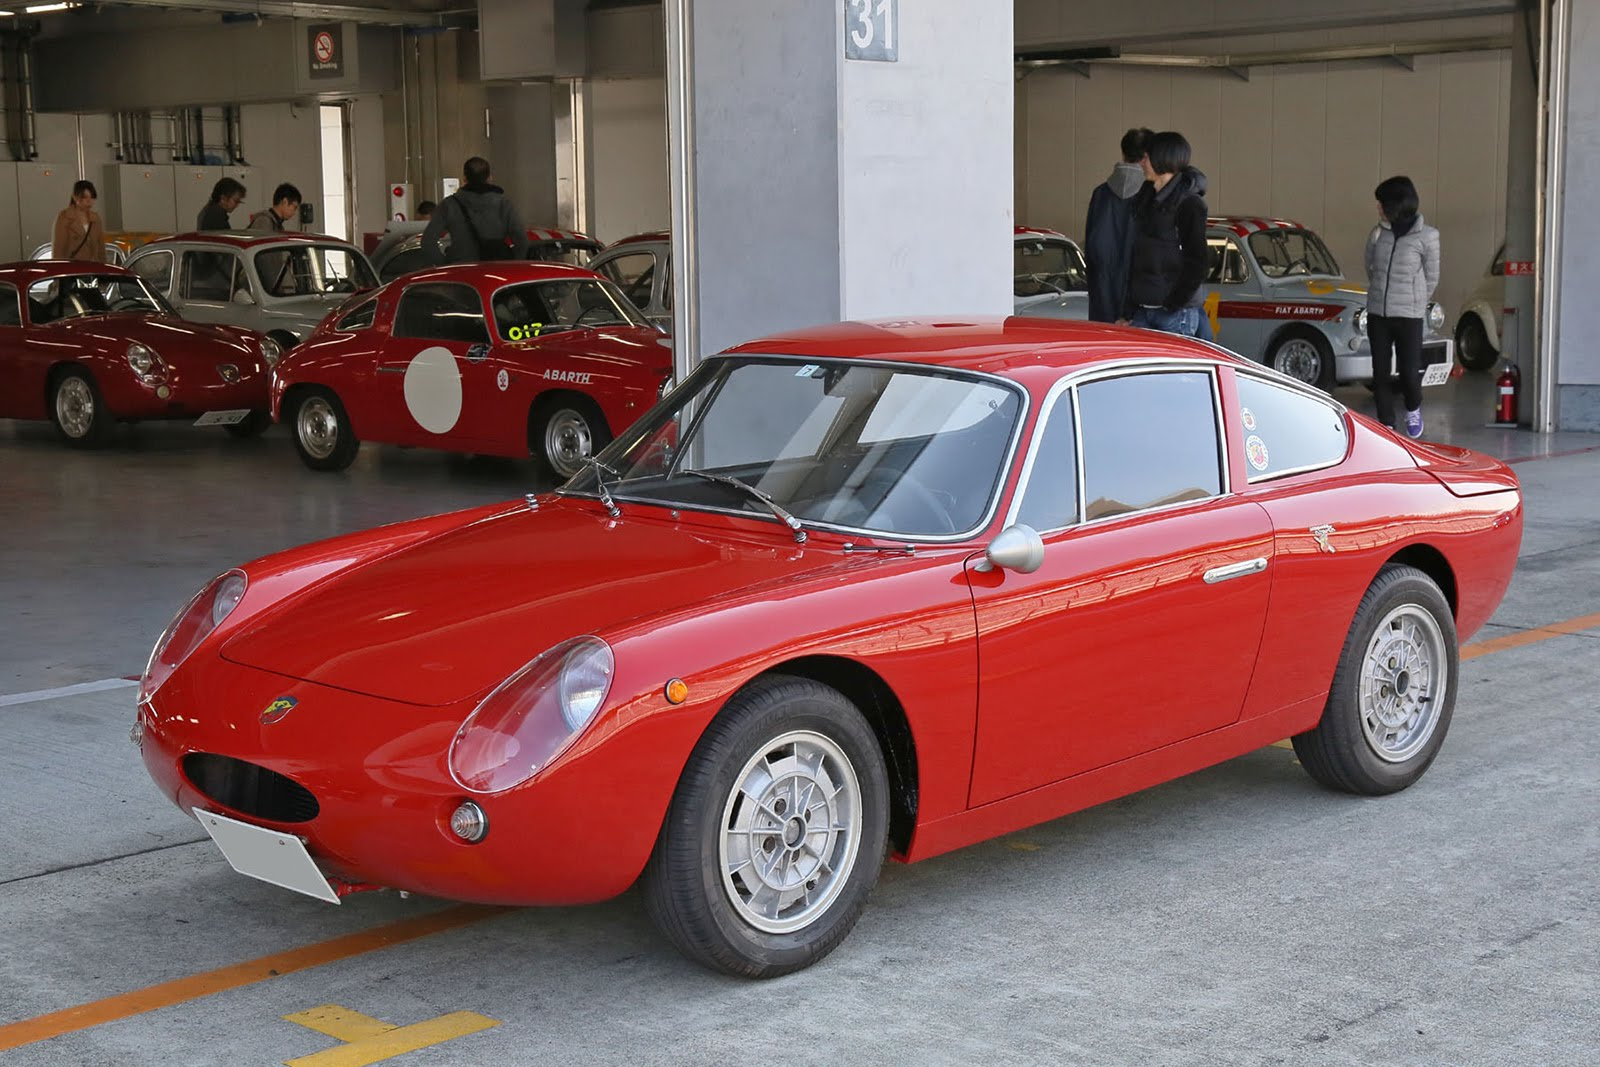 1963 FIAT ABARTH 1000 BIALBERO|アバルトの歴史を刻んだモデル No.049